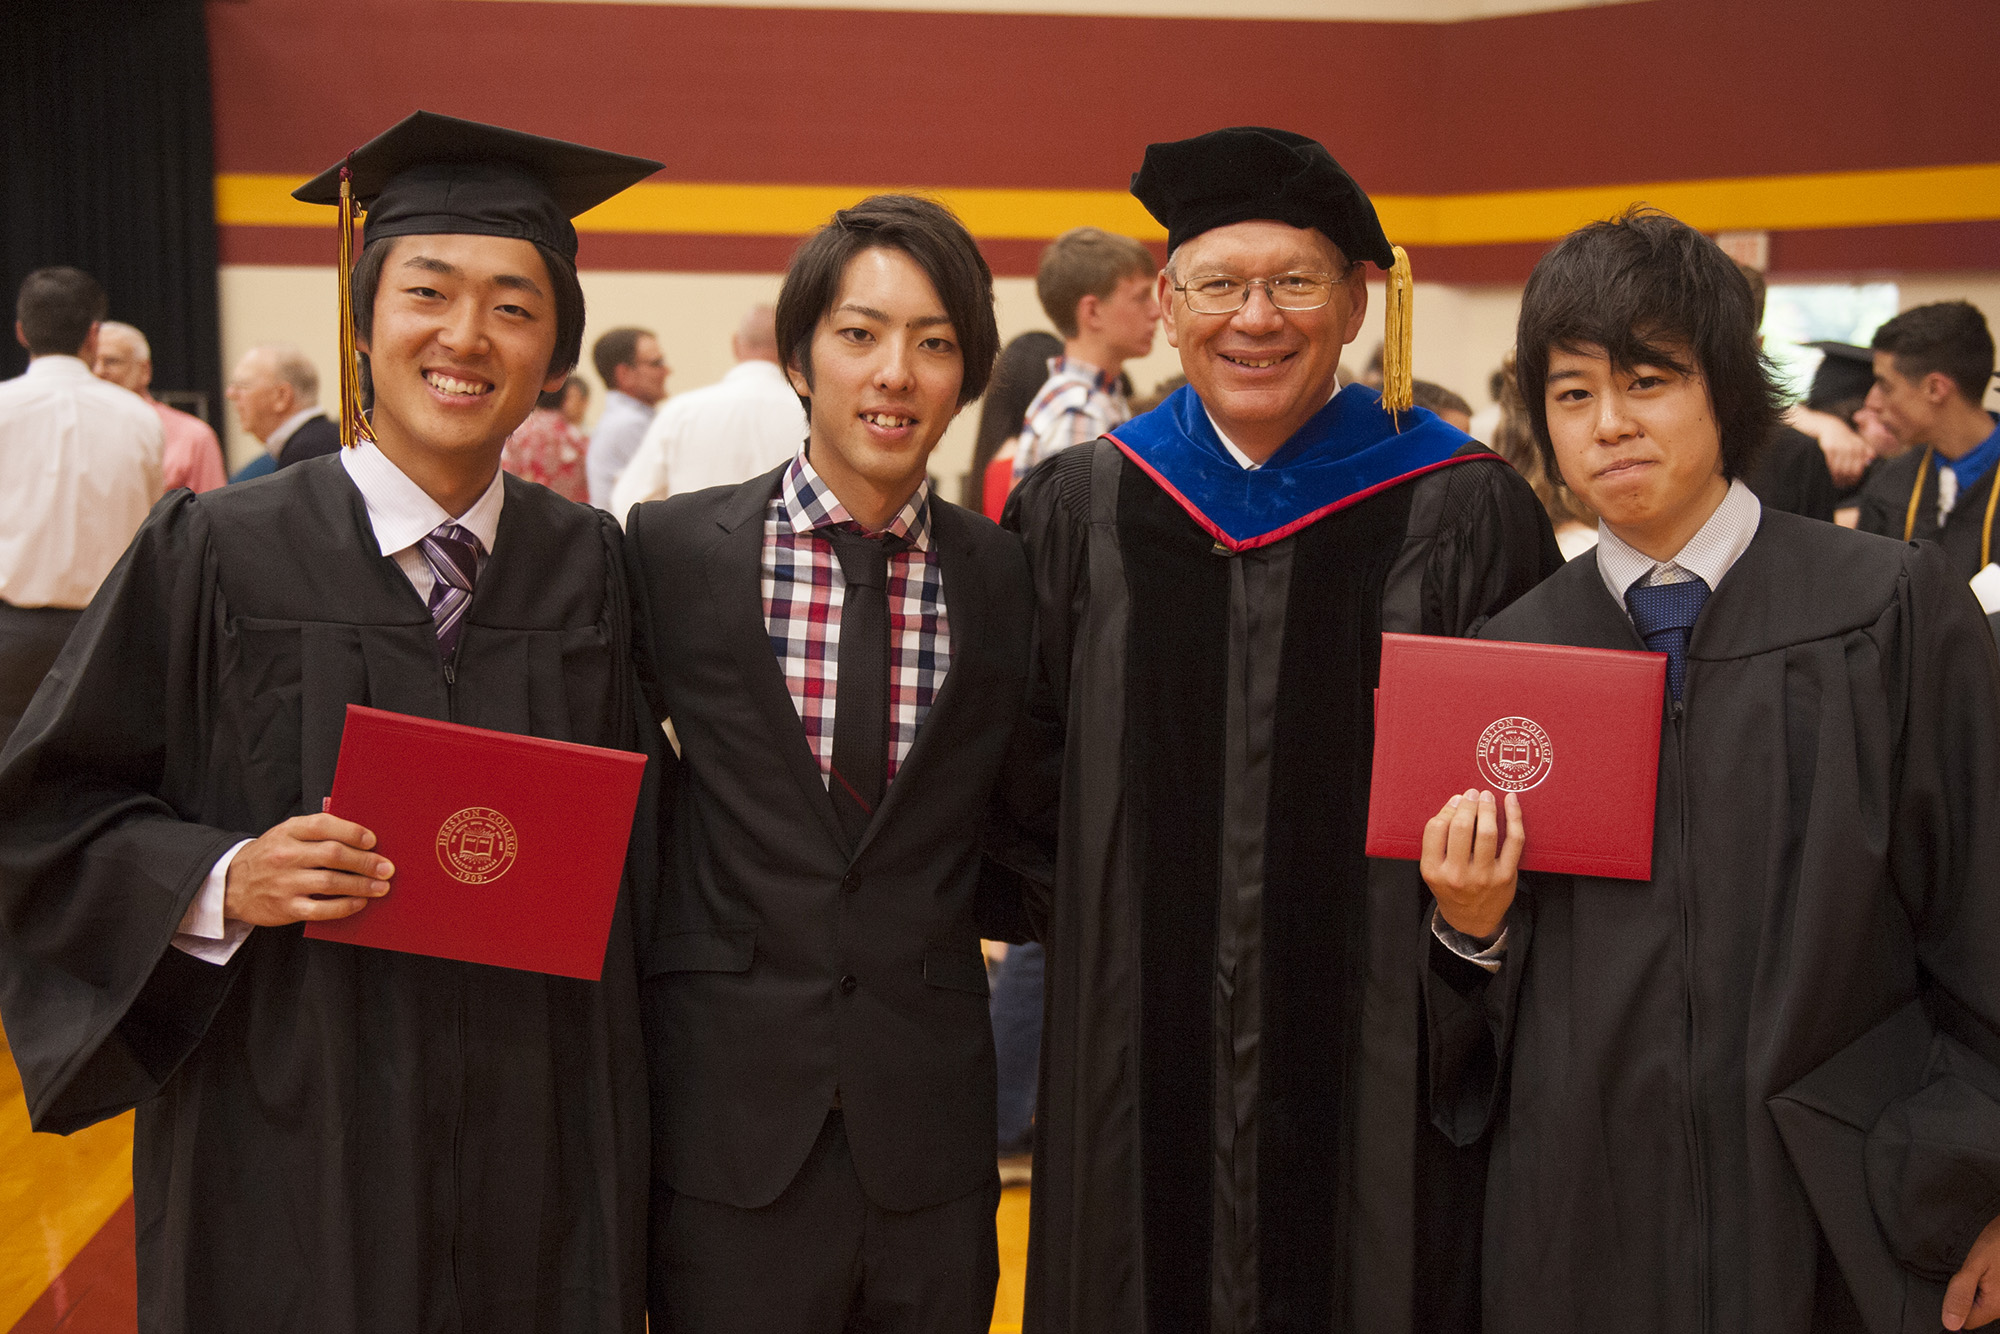 President Howard Keim '72 celebrates with (from left) Yuki Torii '16 (Nishio, Japan), Satoshi Hoshino '16 (Saitama-ken, Japan) and Shimon Shike '16 (Iwaki, Japan).